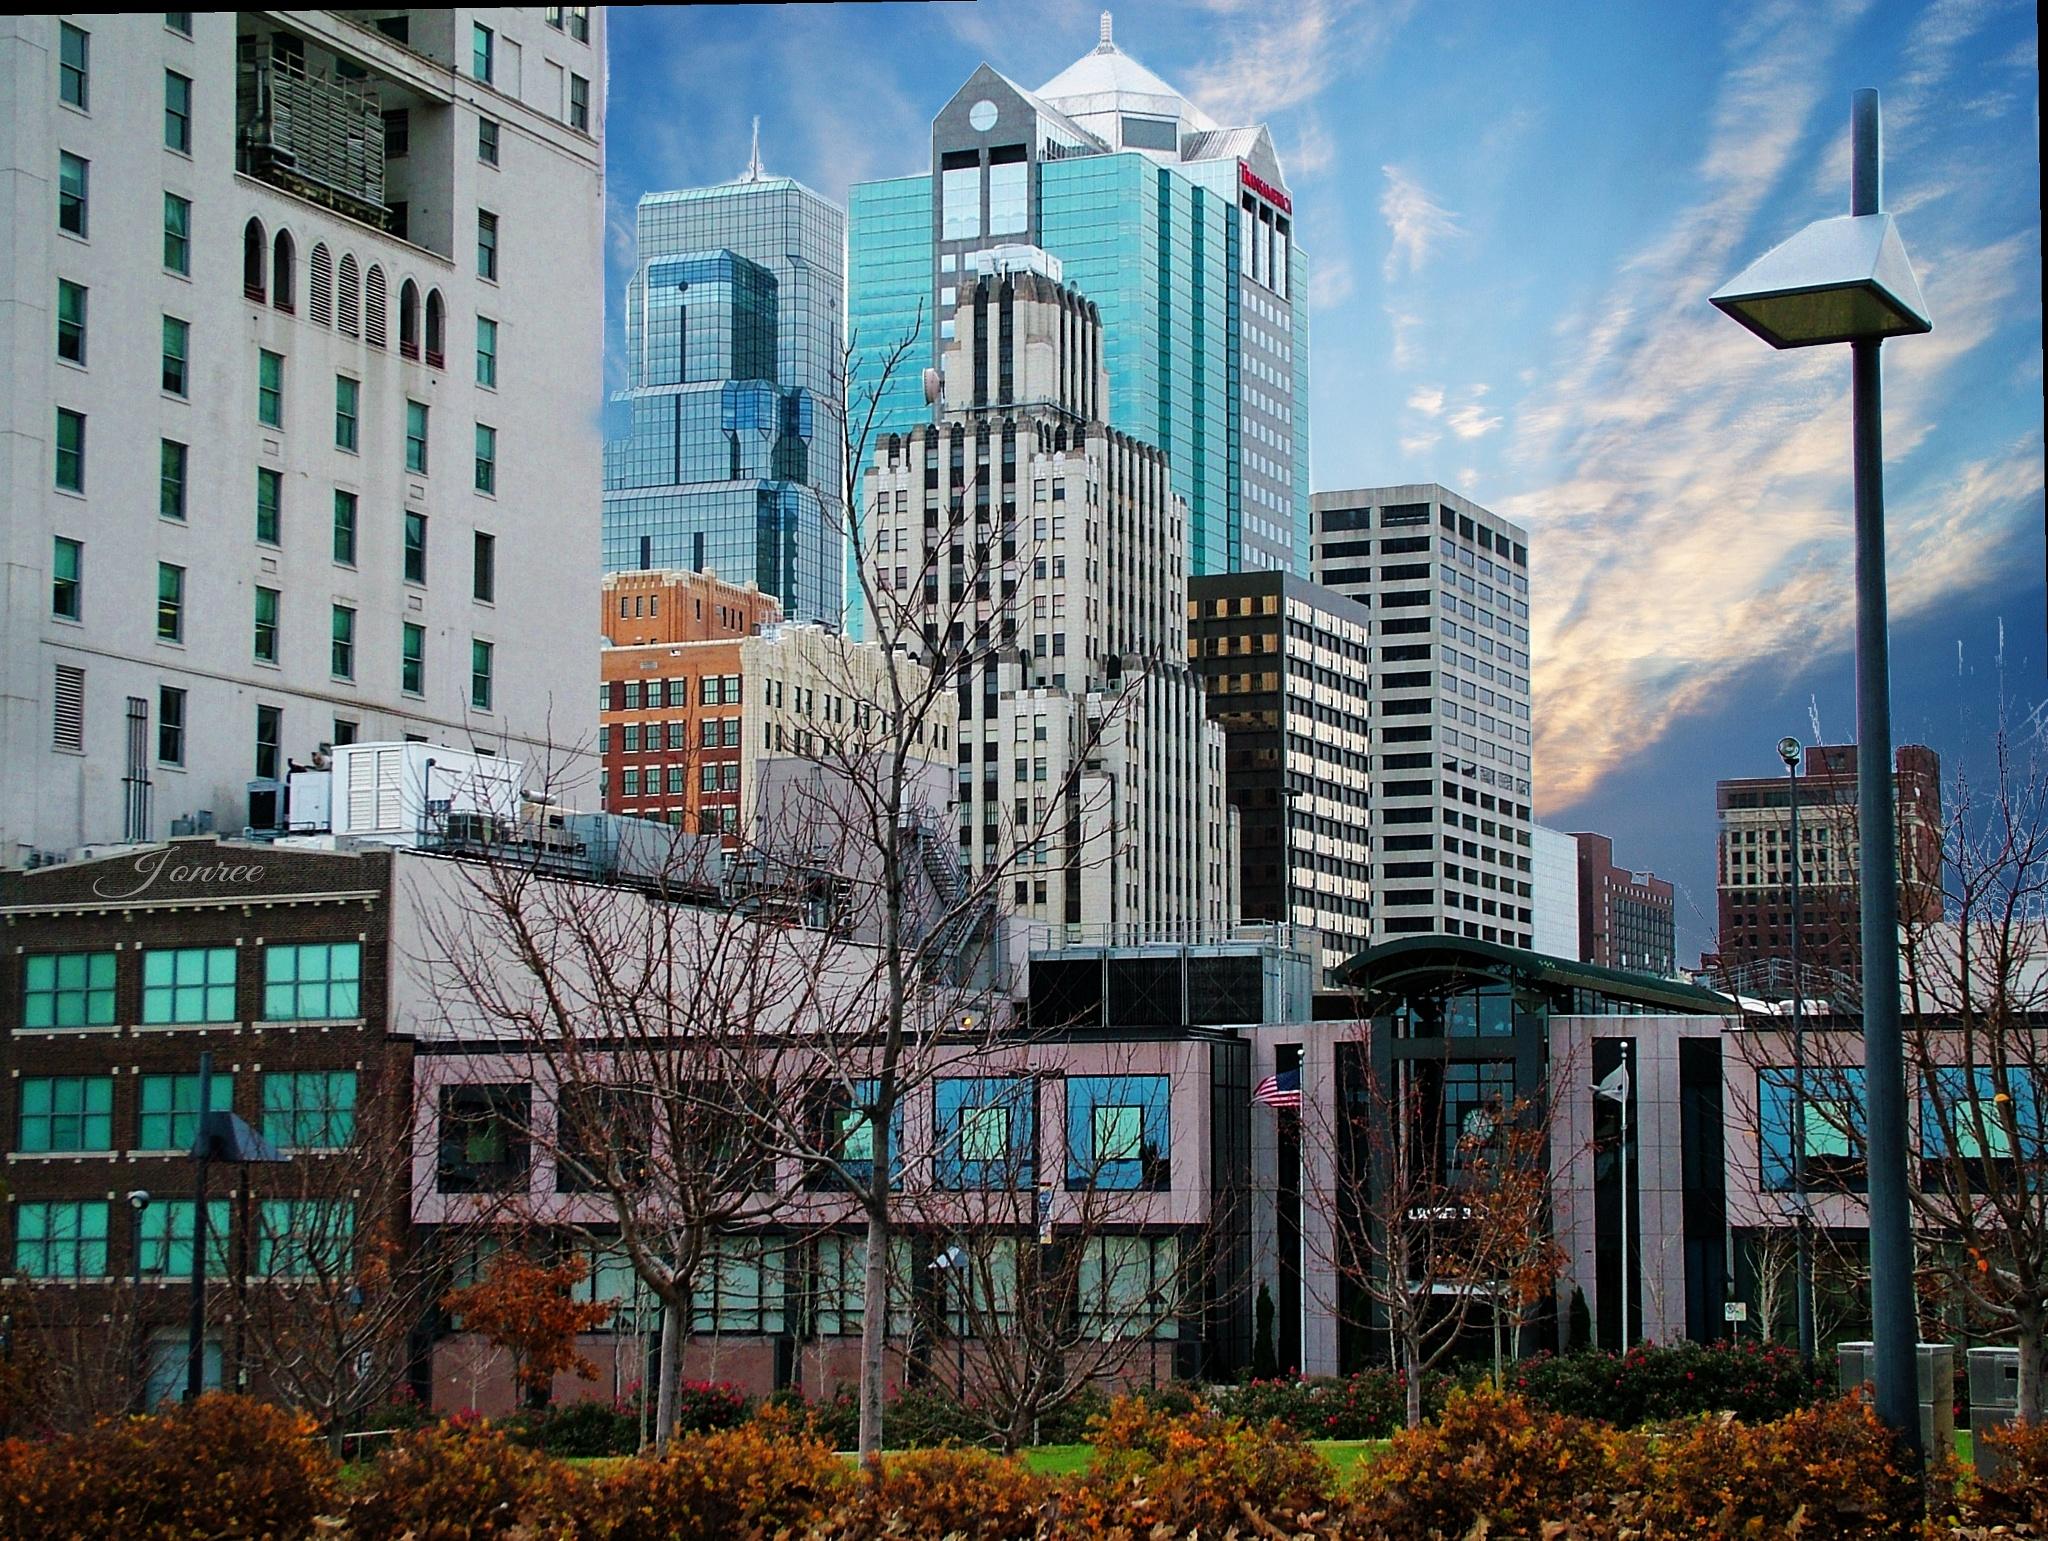 Downtown Kansas City viewed from East Side by Lorenzo (Larry) Jonree